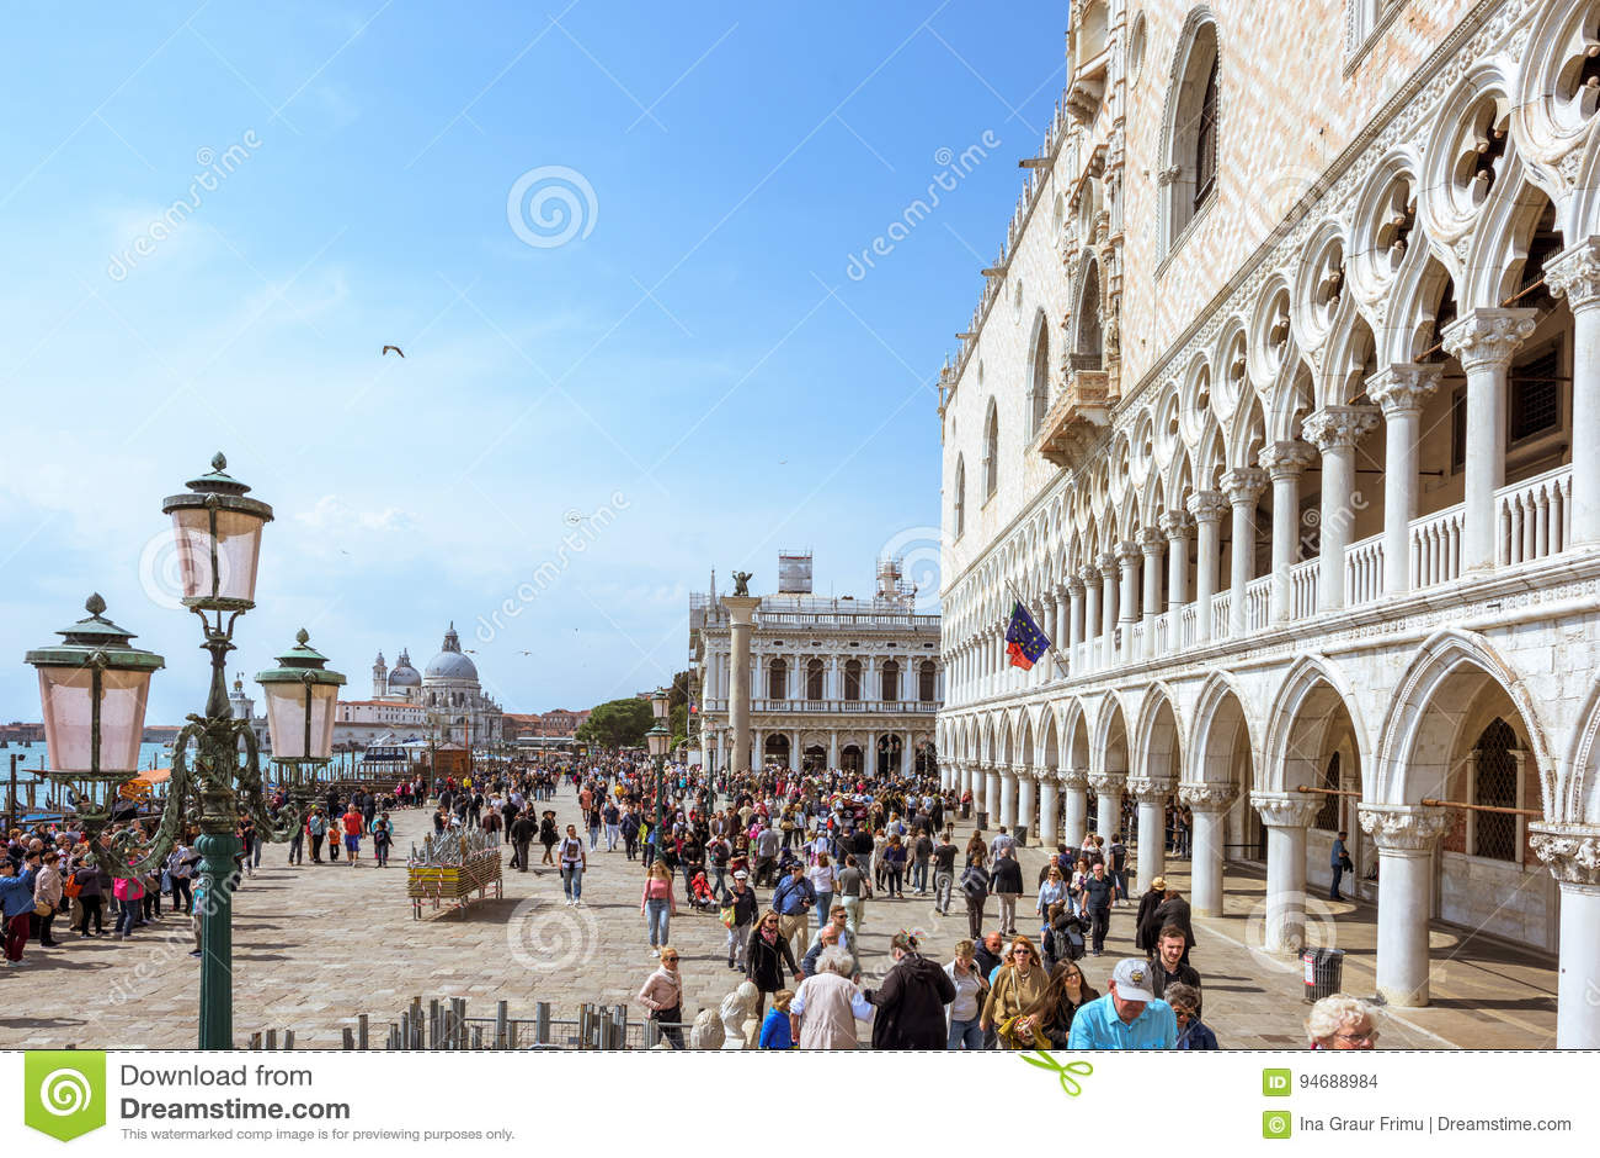 VENICE, ITALY - APRIL 02, 2017: San Marco Square In Venice, Italy ...